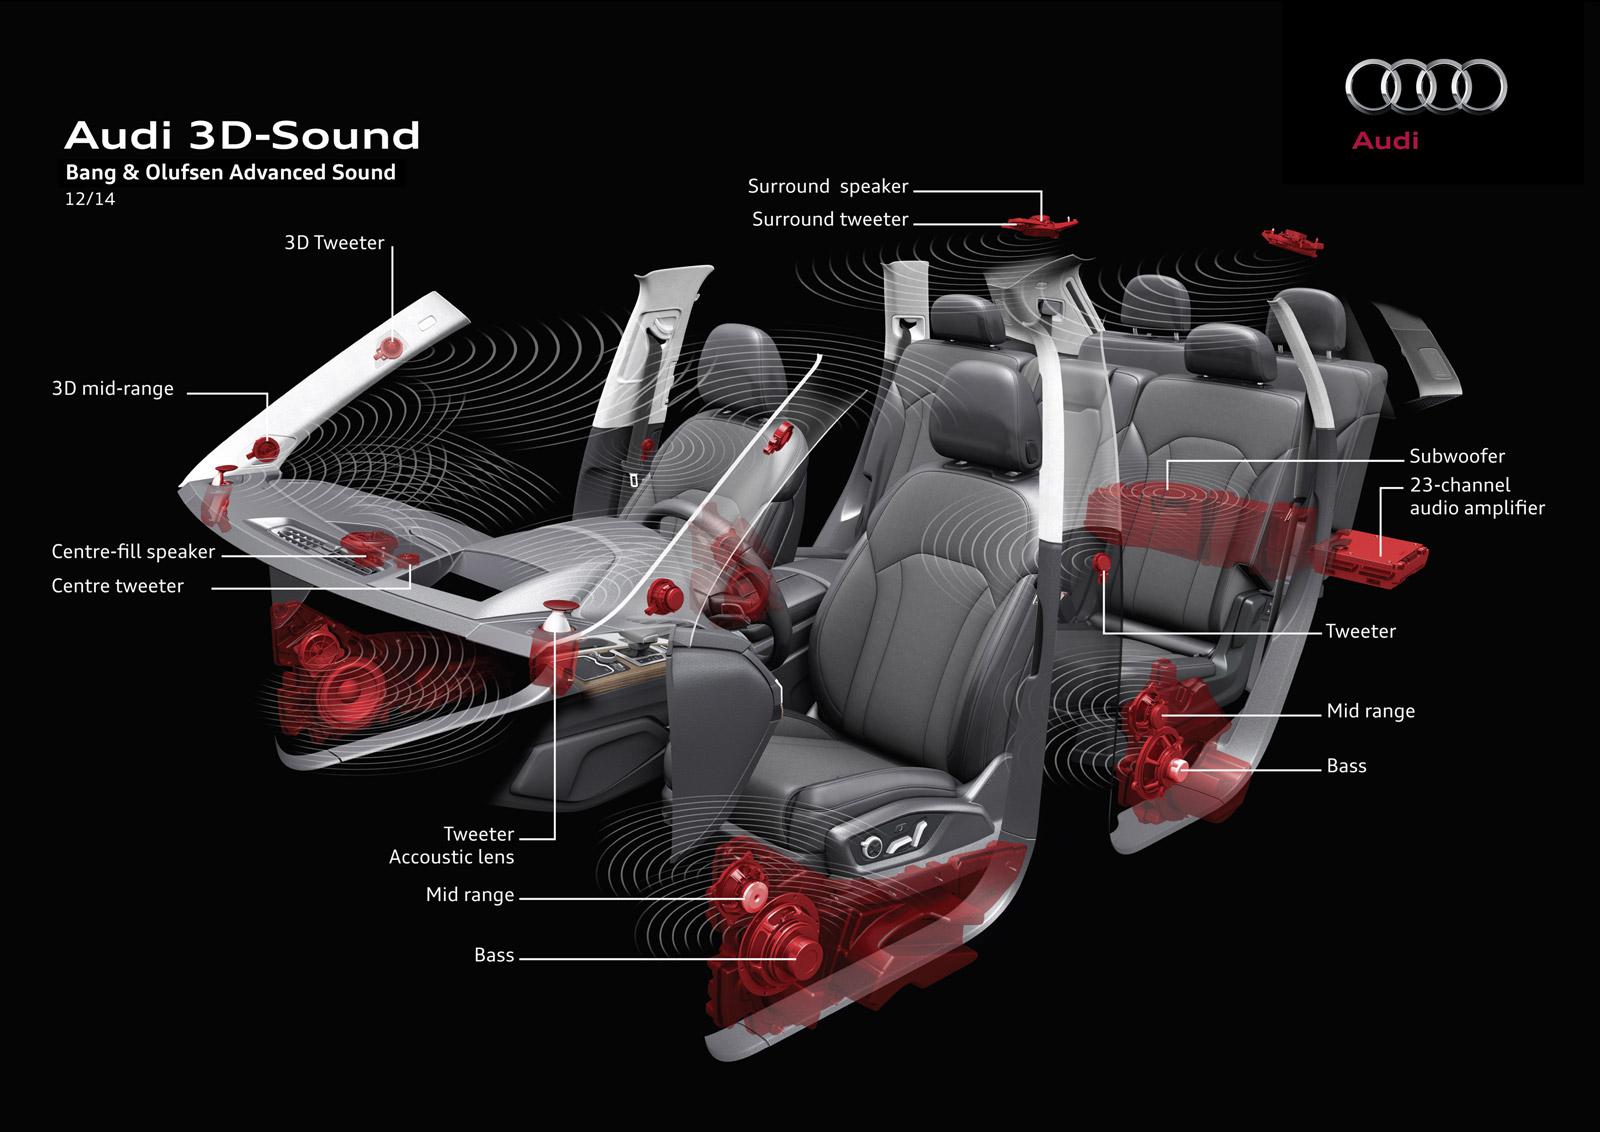 2016 Audi Q7 Arrival Marks Intro Of 23 Speaker 3d Sound System